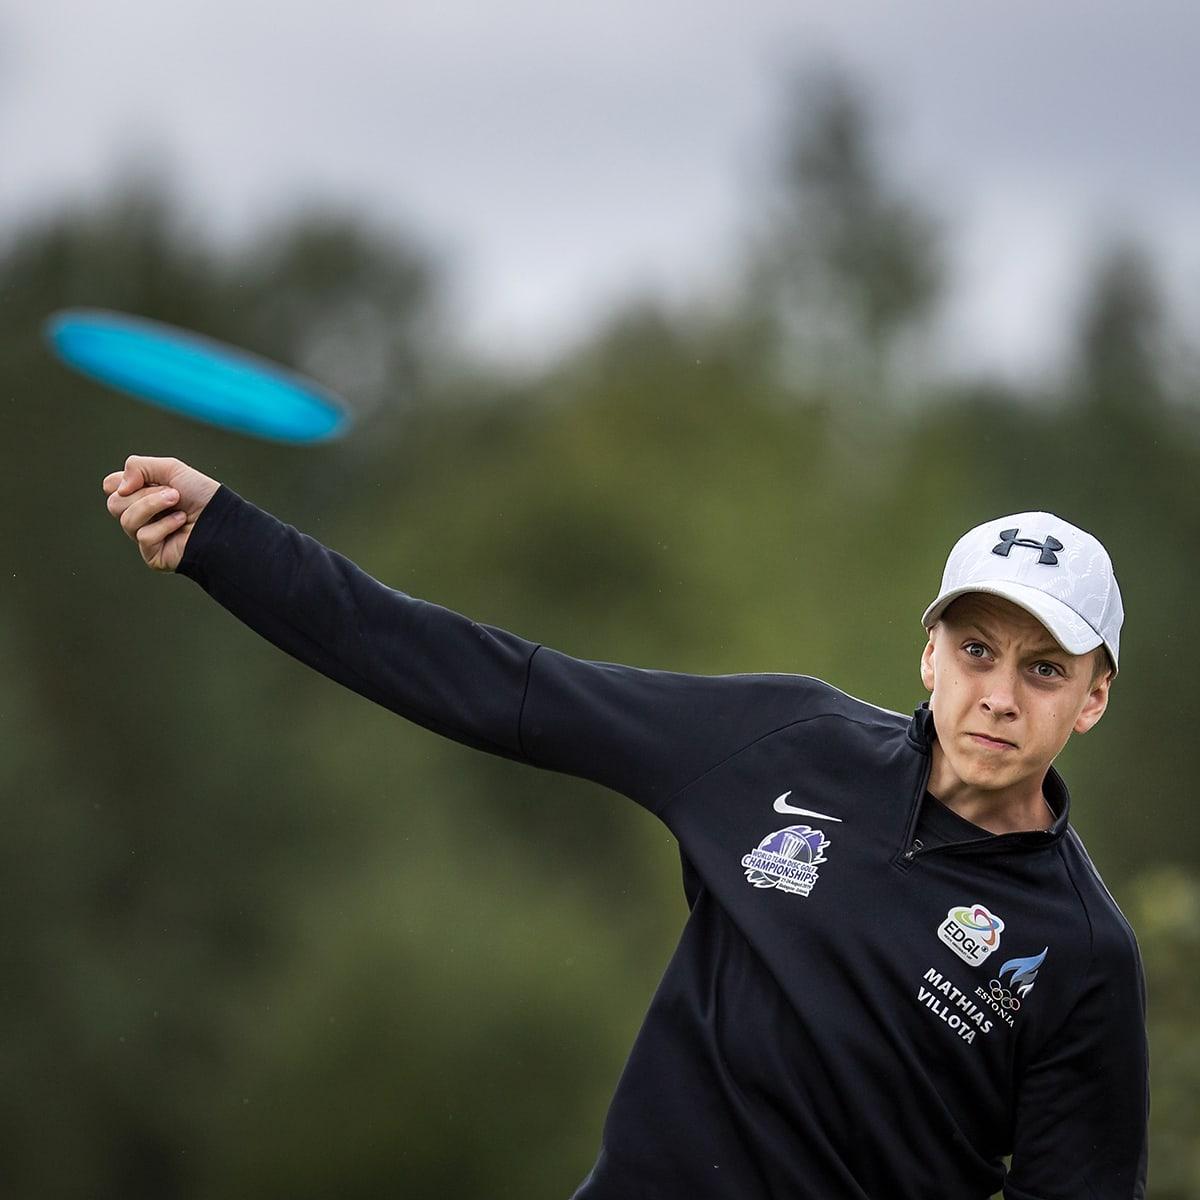 Mattias Villota